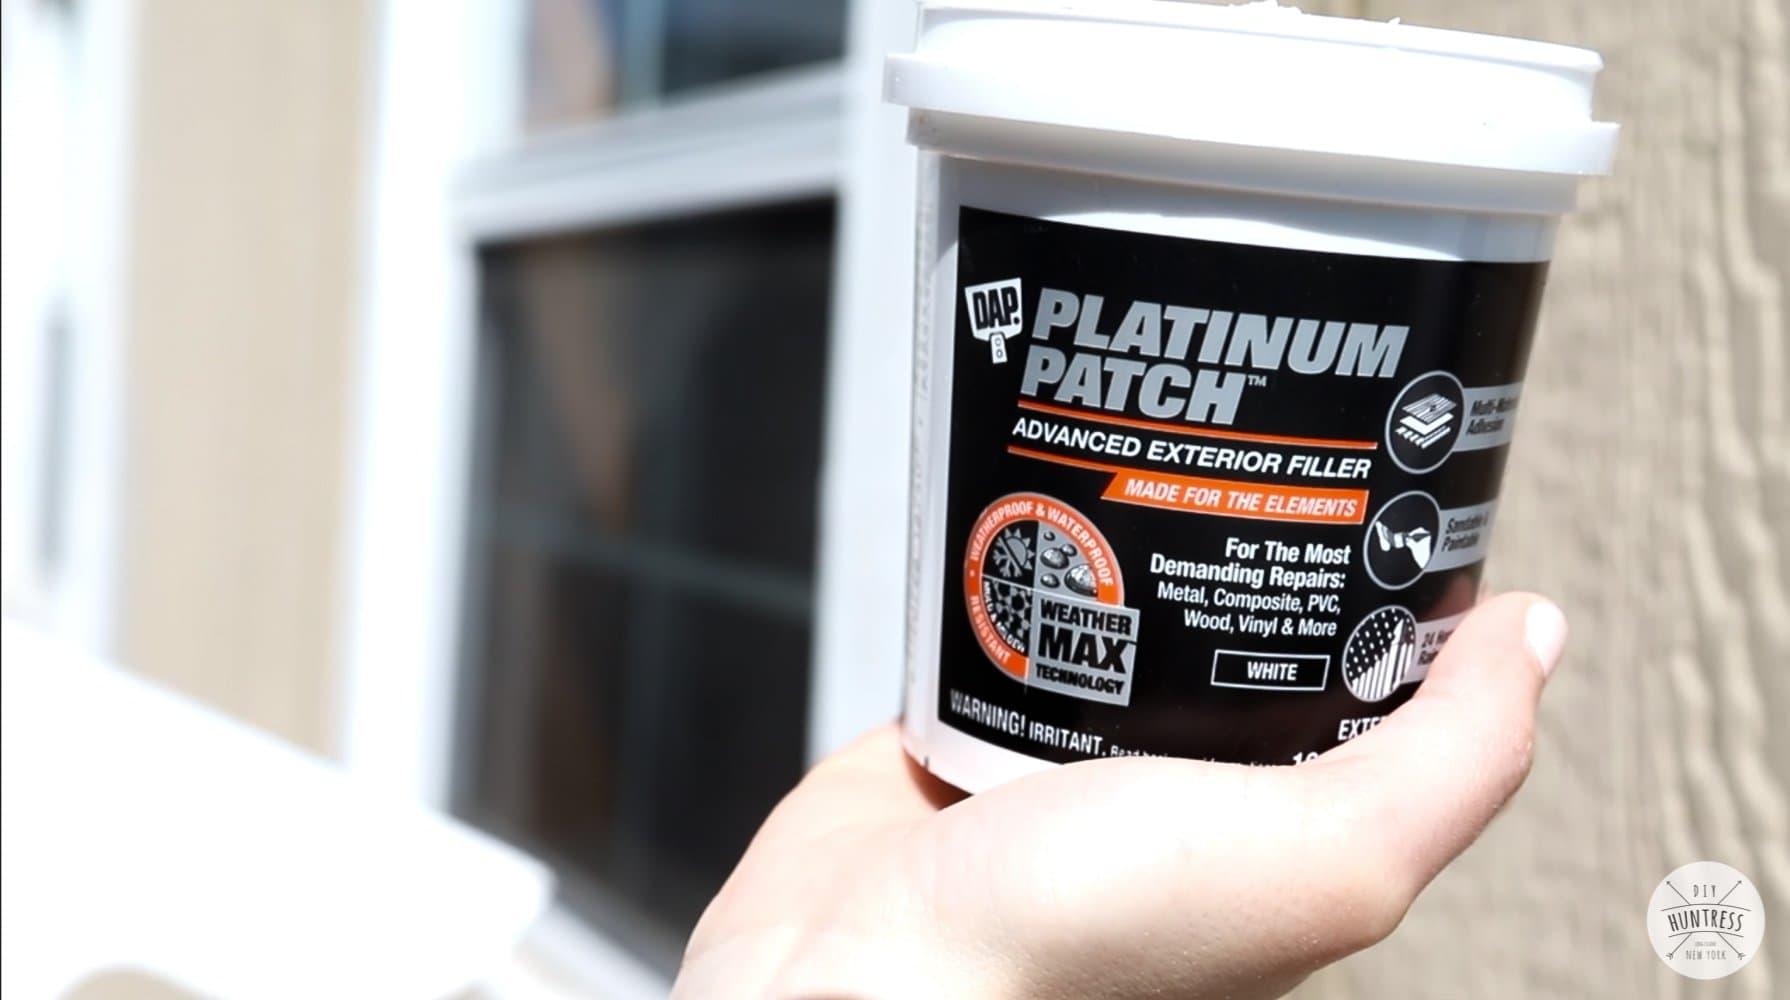 dap platinum patch on shed